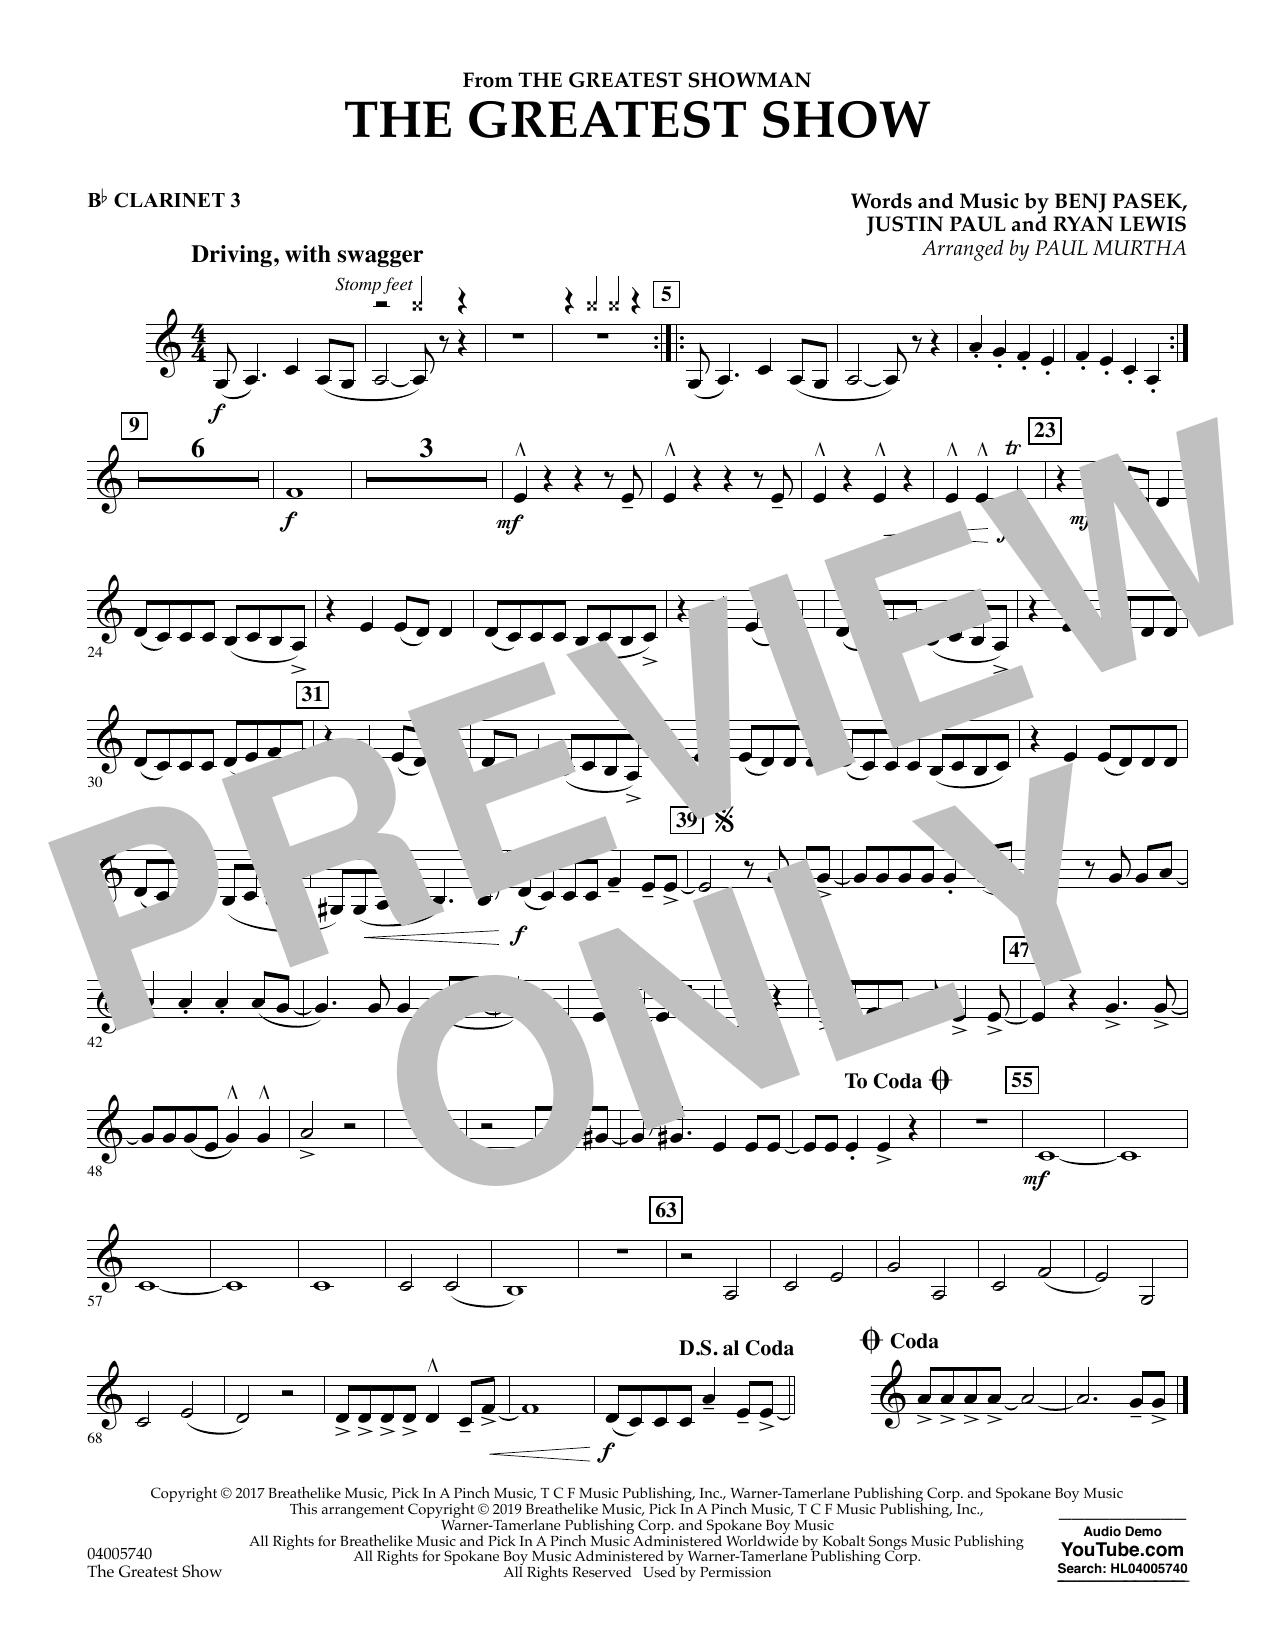 The Greatest Show  (arr. Paul Murtha) - Bb Clarinet 3 (Concert Band)